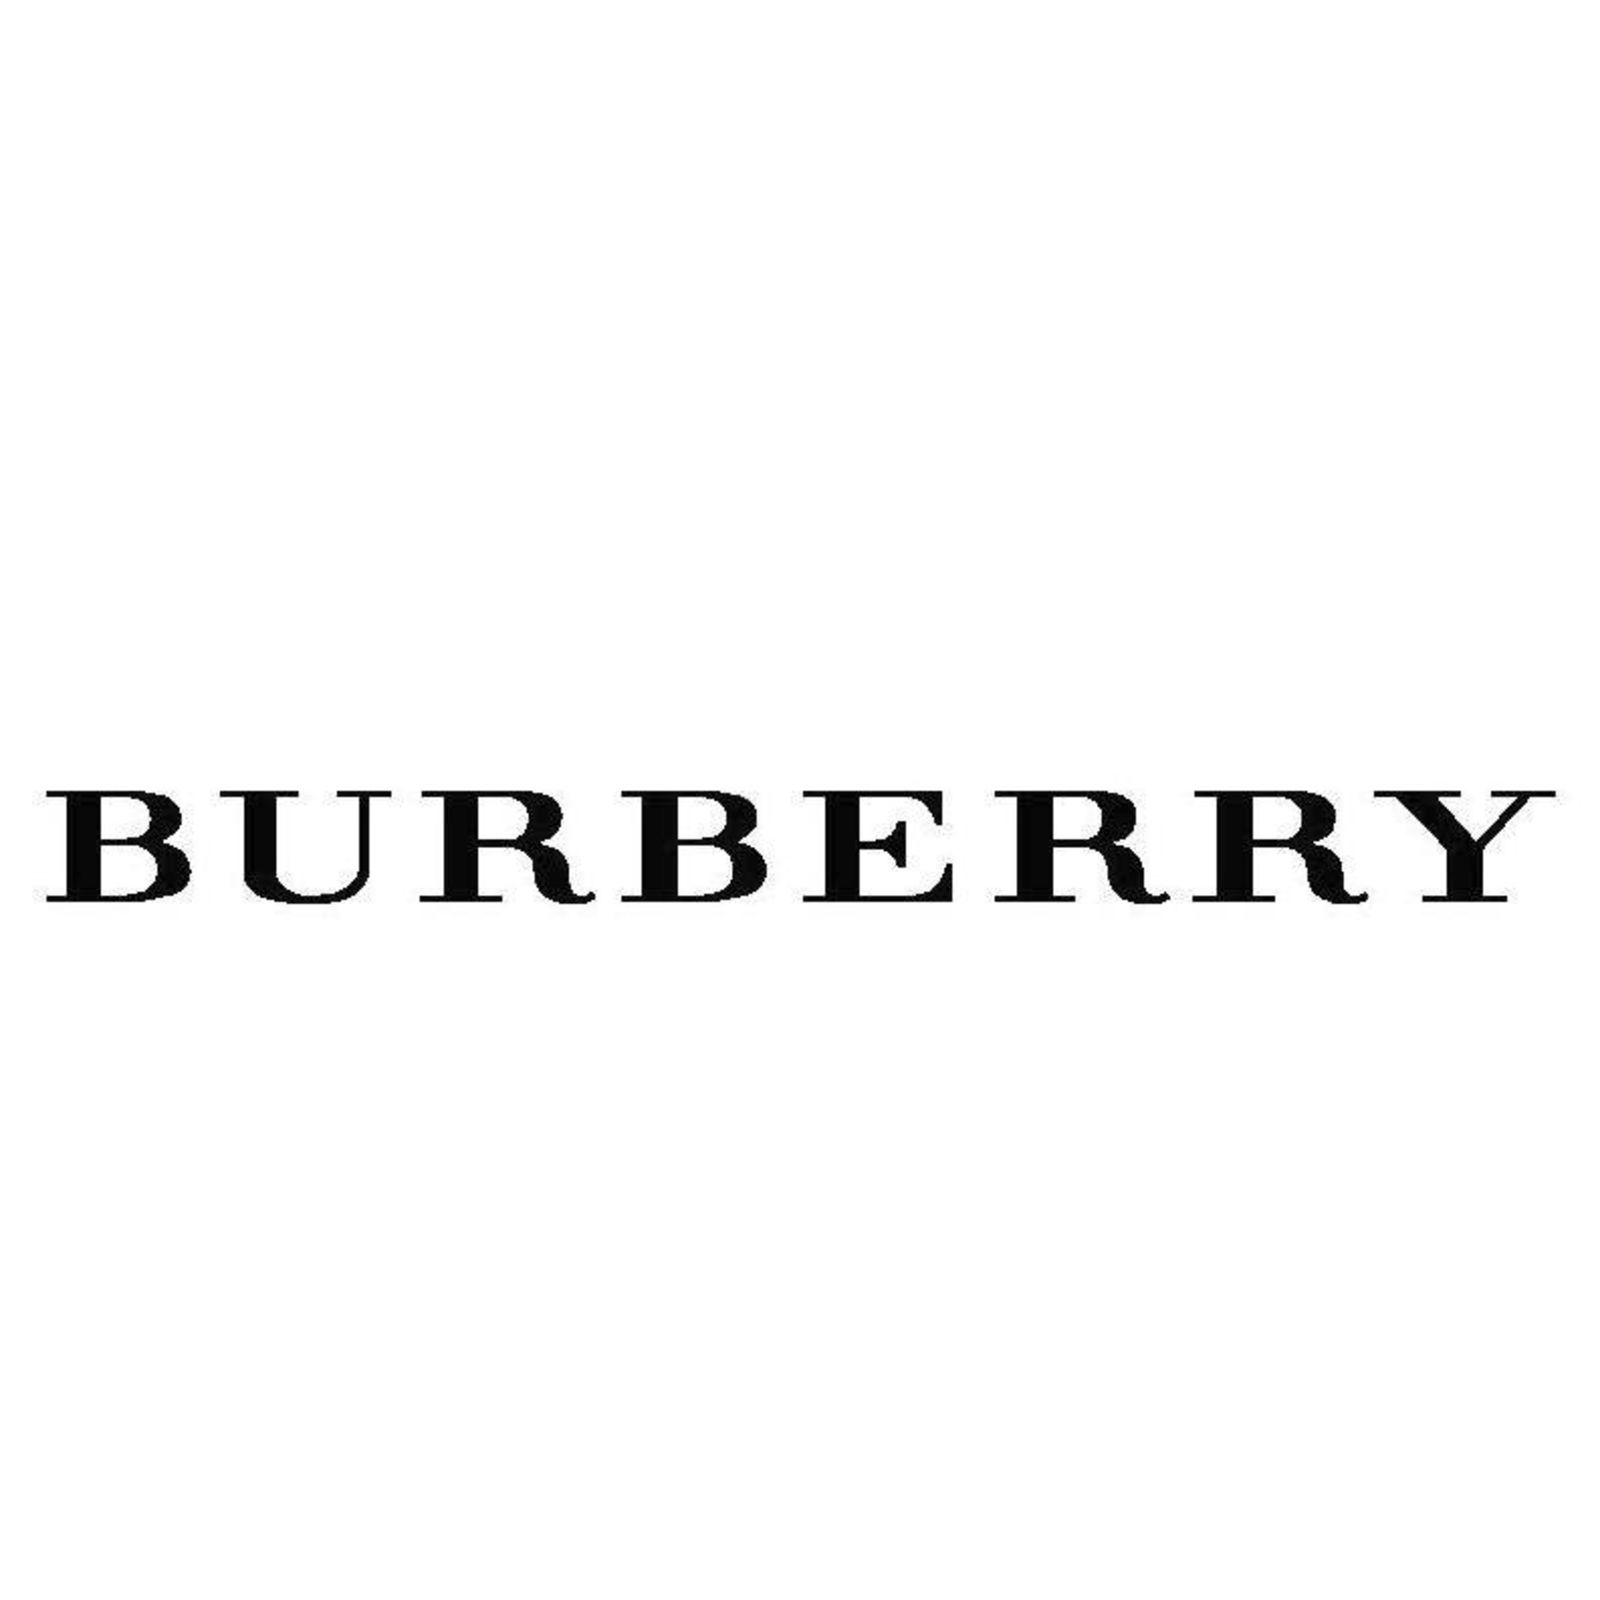 BURBERRY (Bild 1)